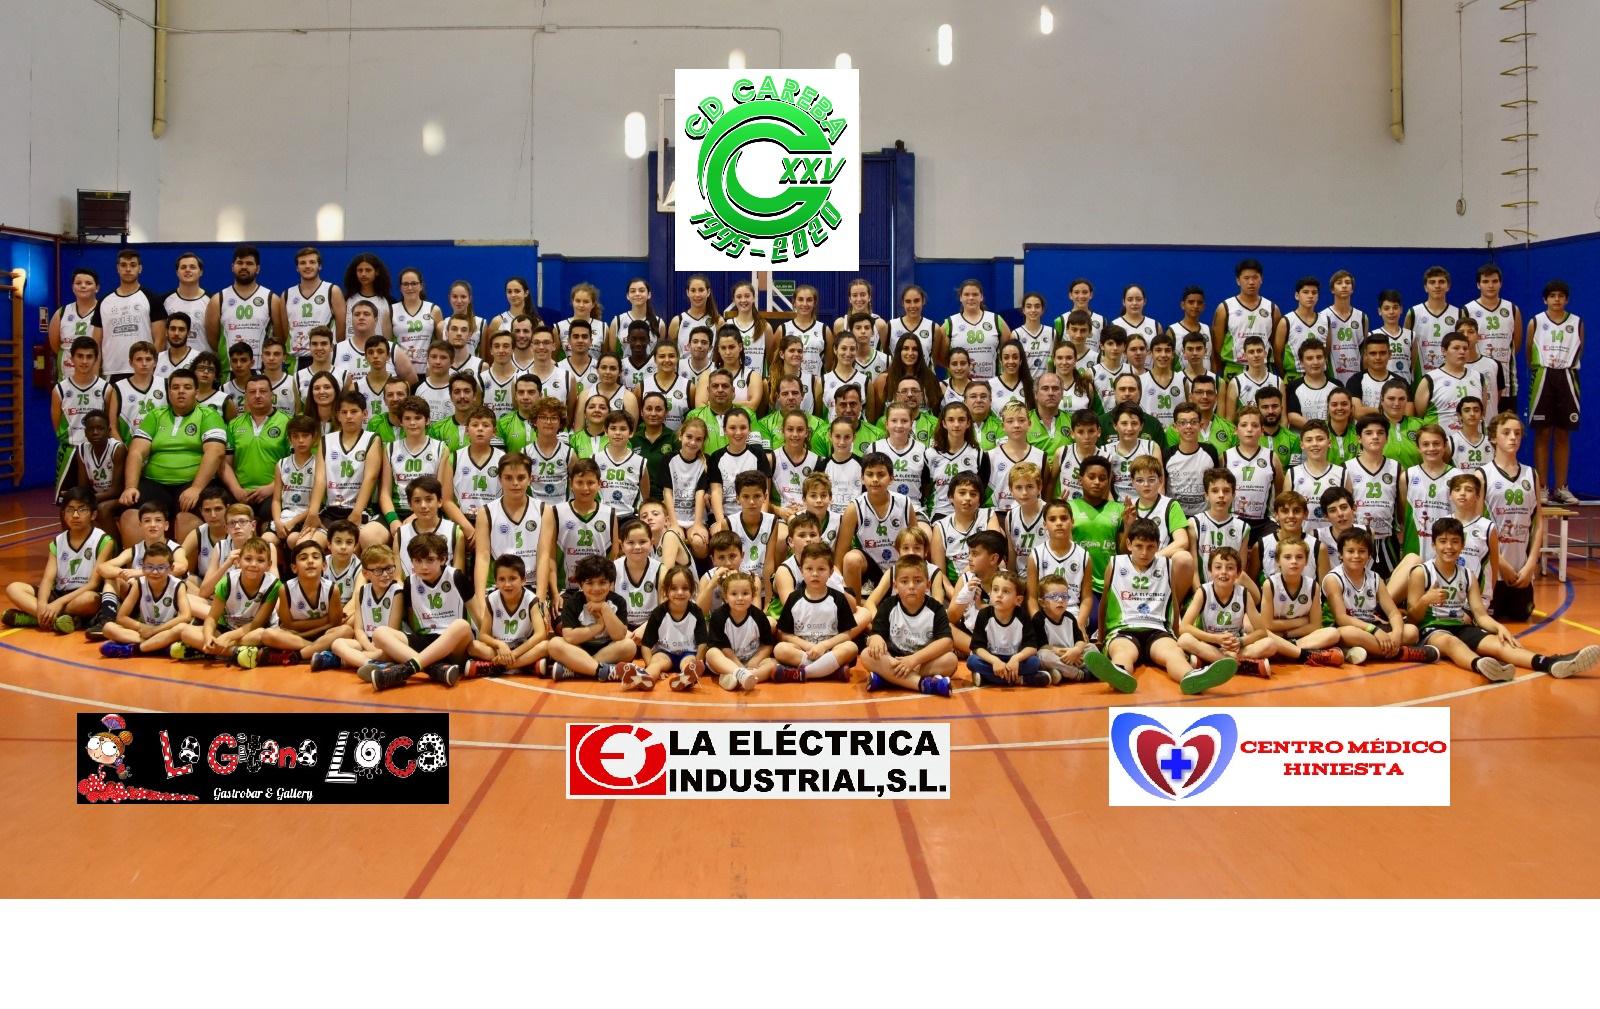 Club Deportivo Careba